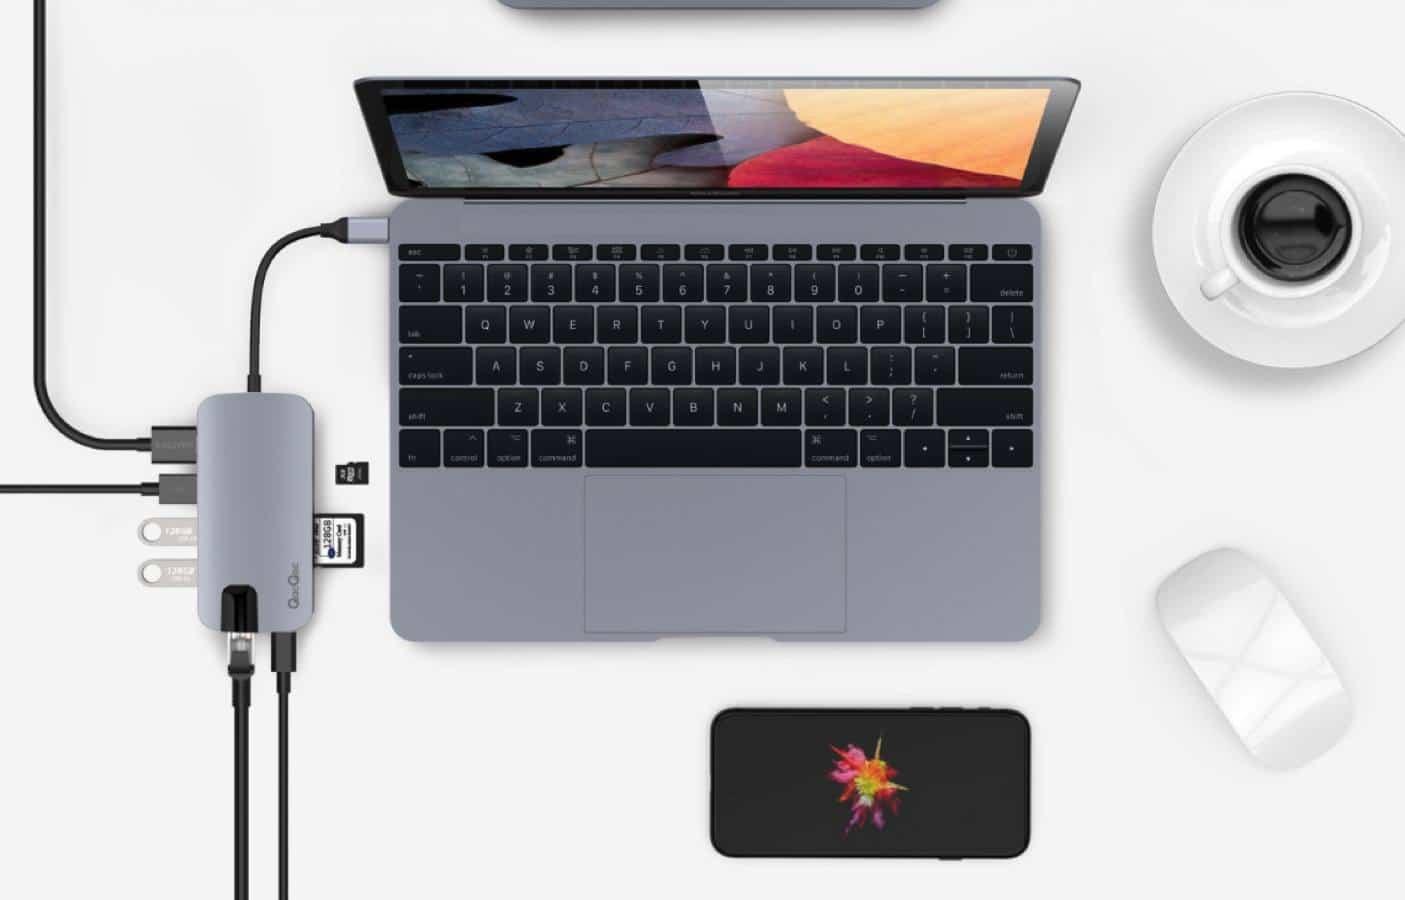 macbook usb-c hub